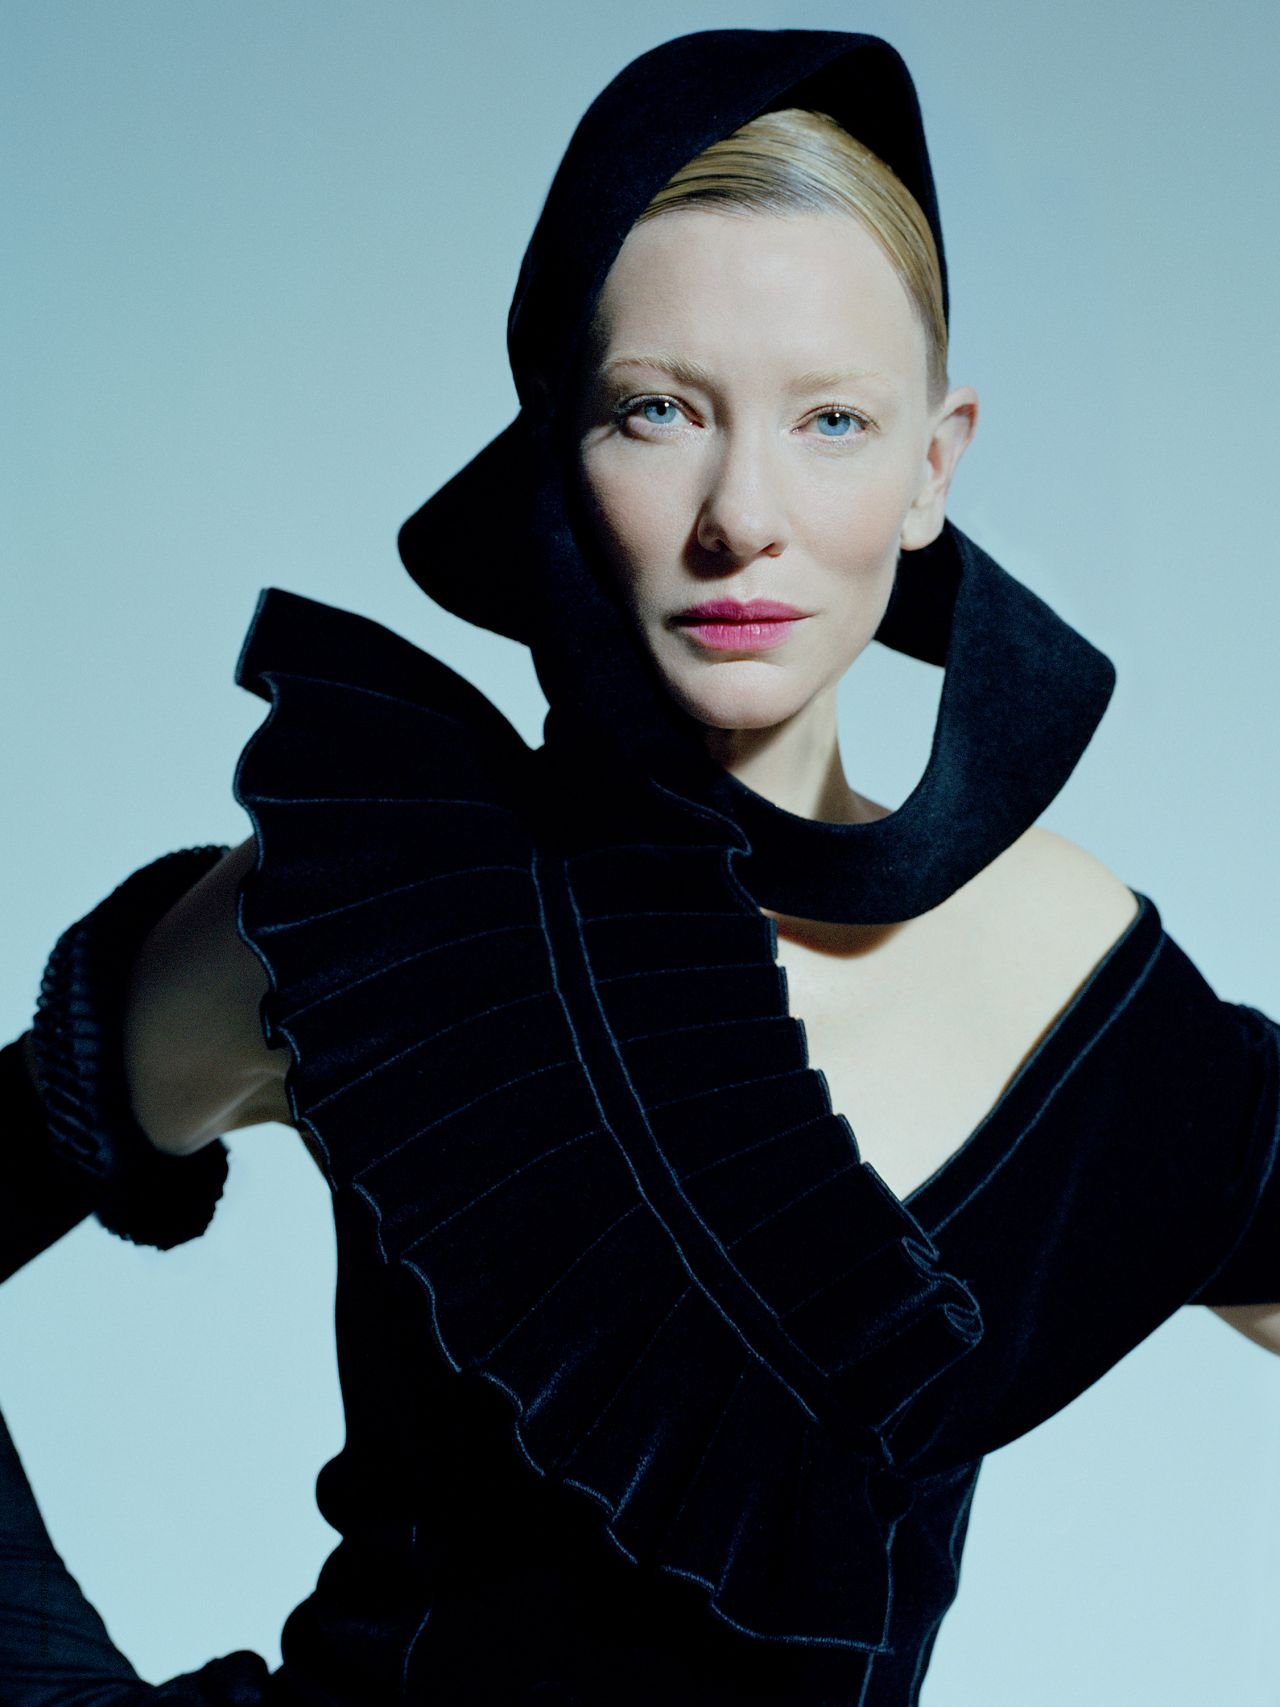 Cate Blanchett – Photoshoot for W Magazine December 2015